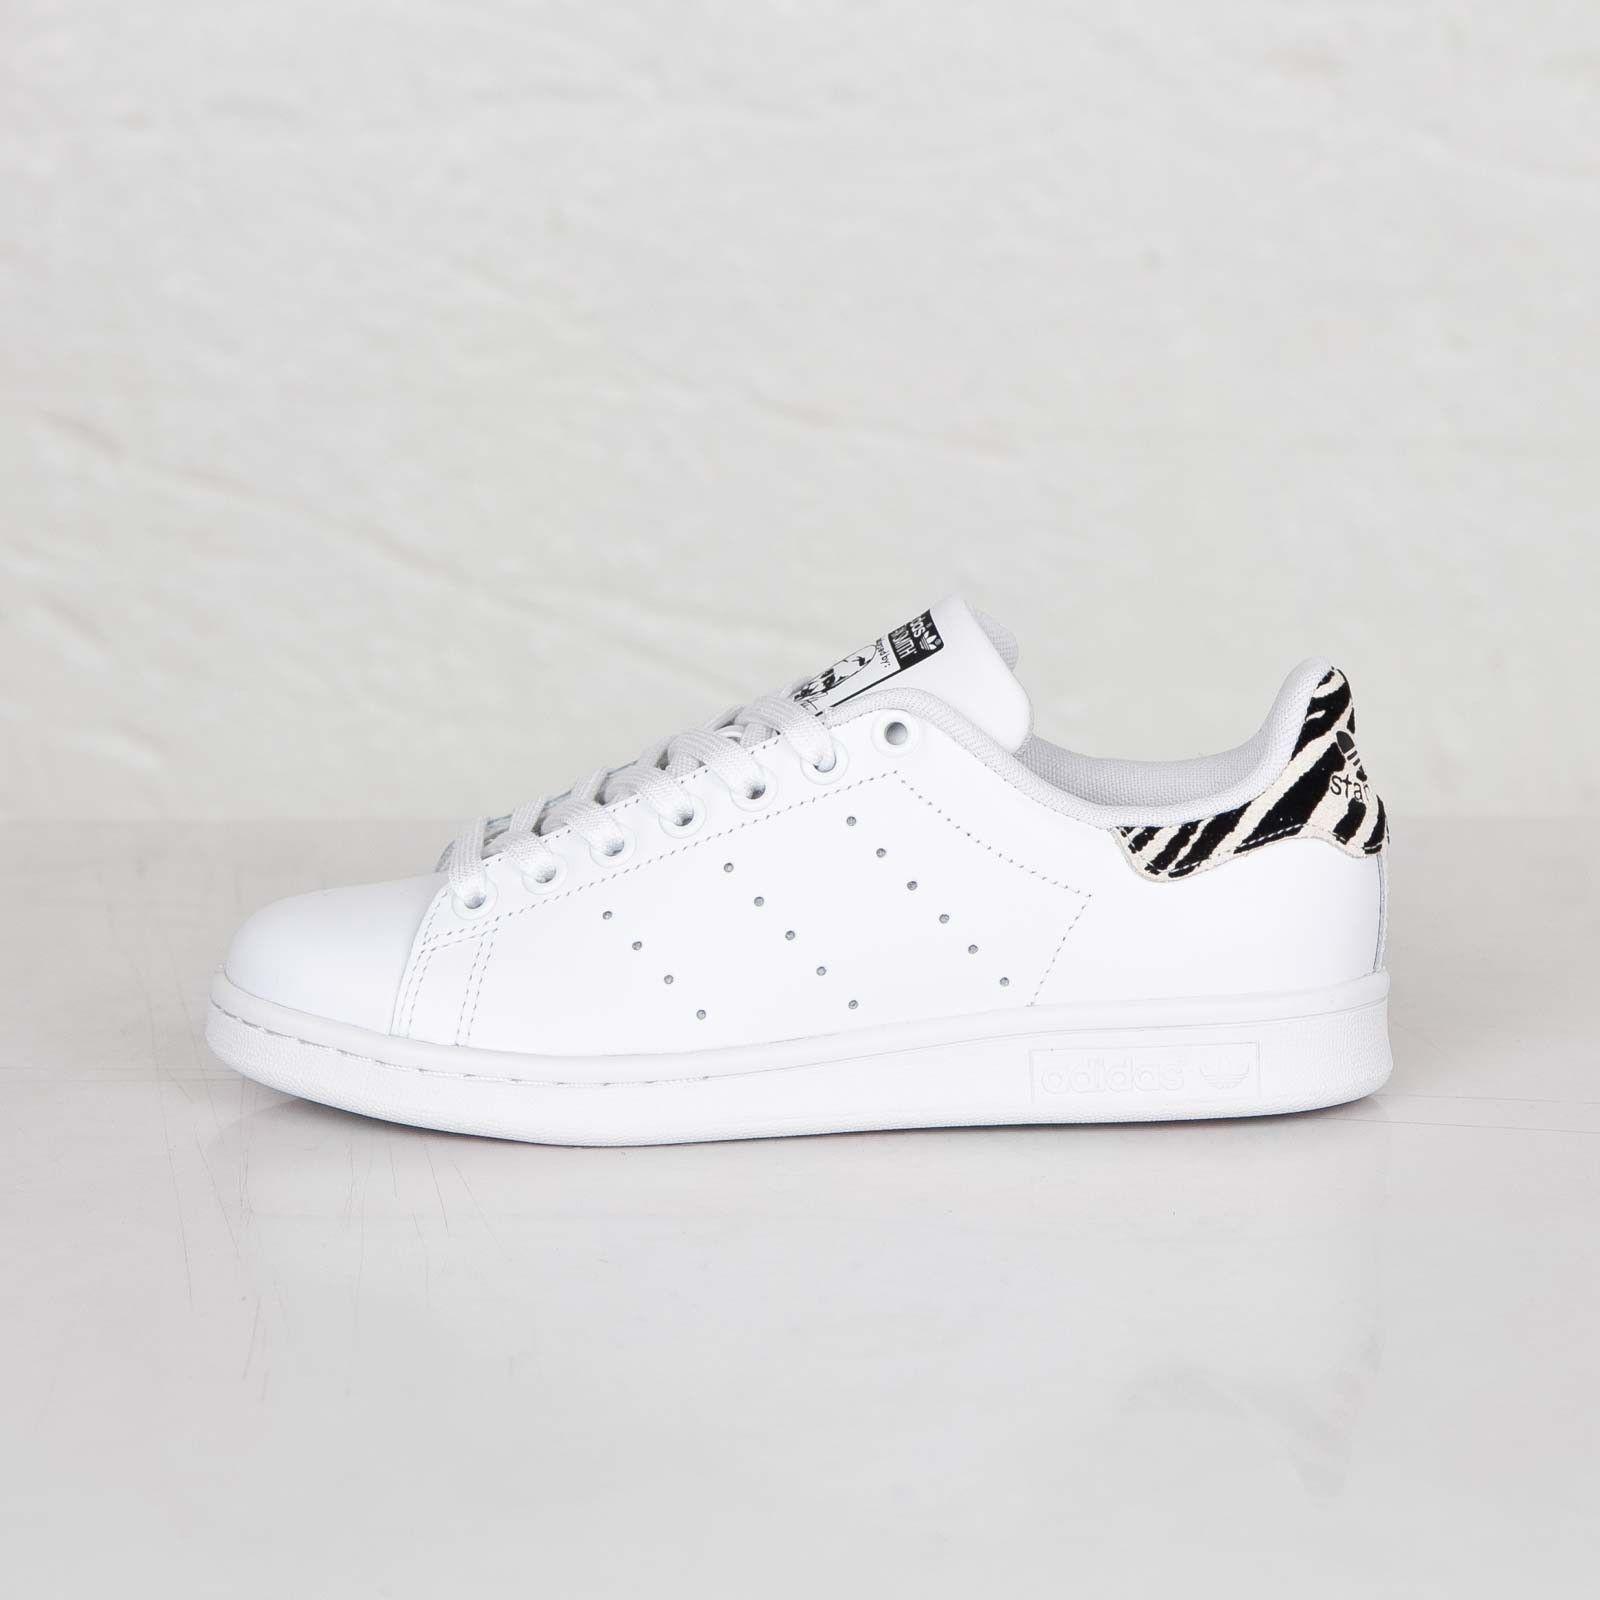 adidas stan smith femme blanche zebre